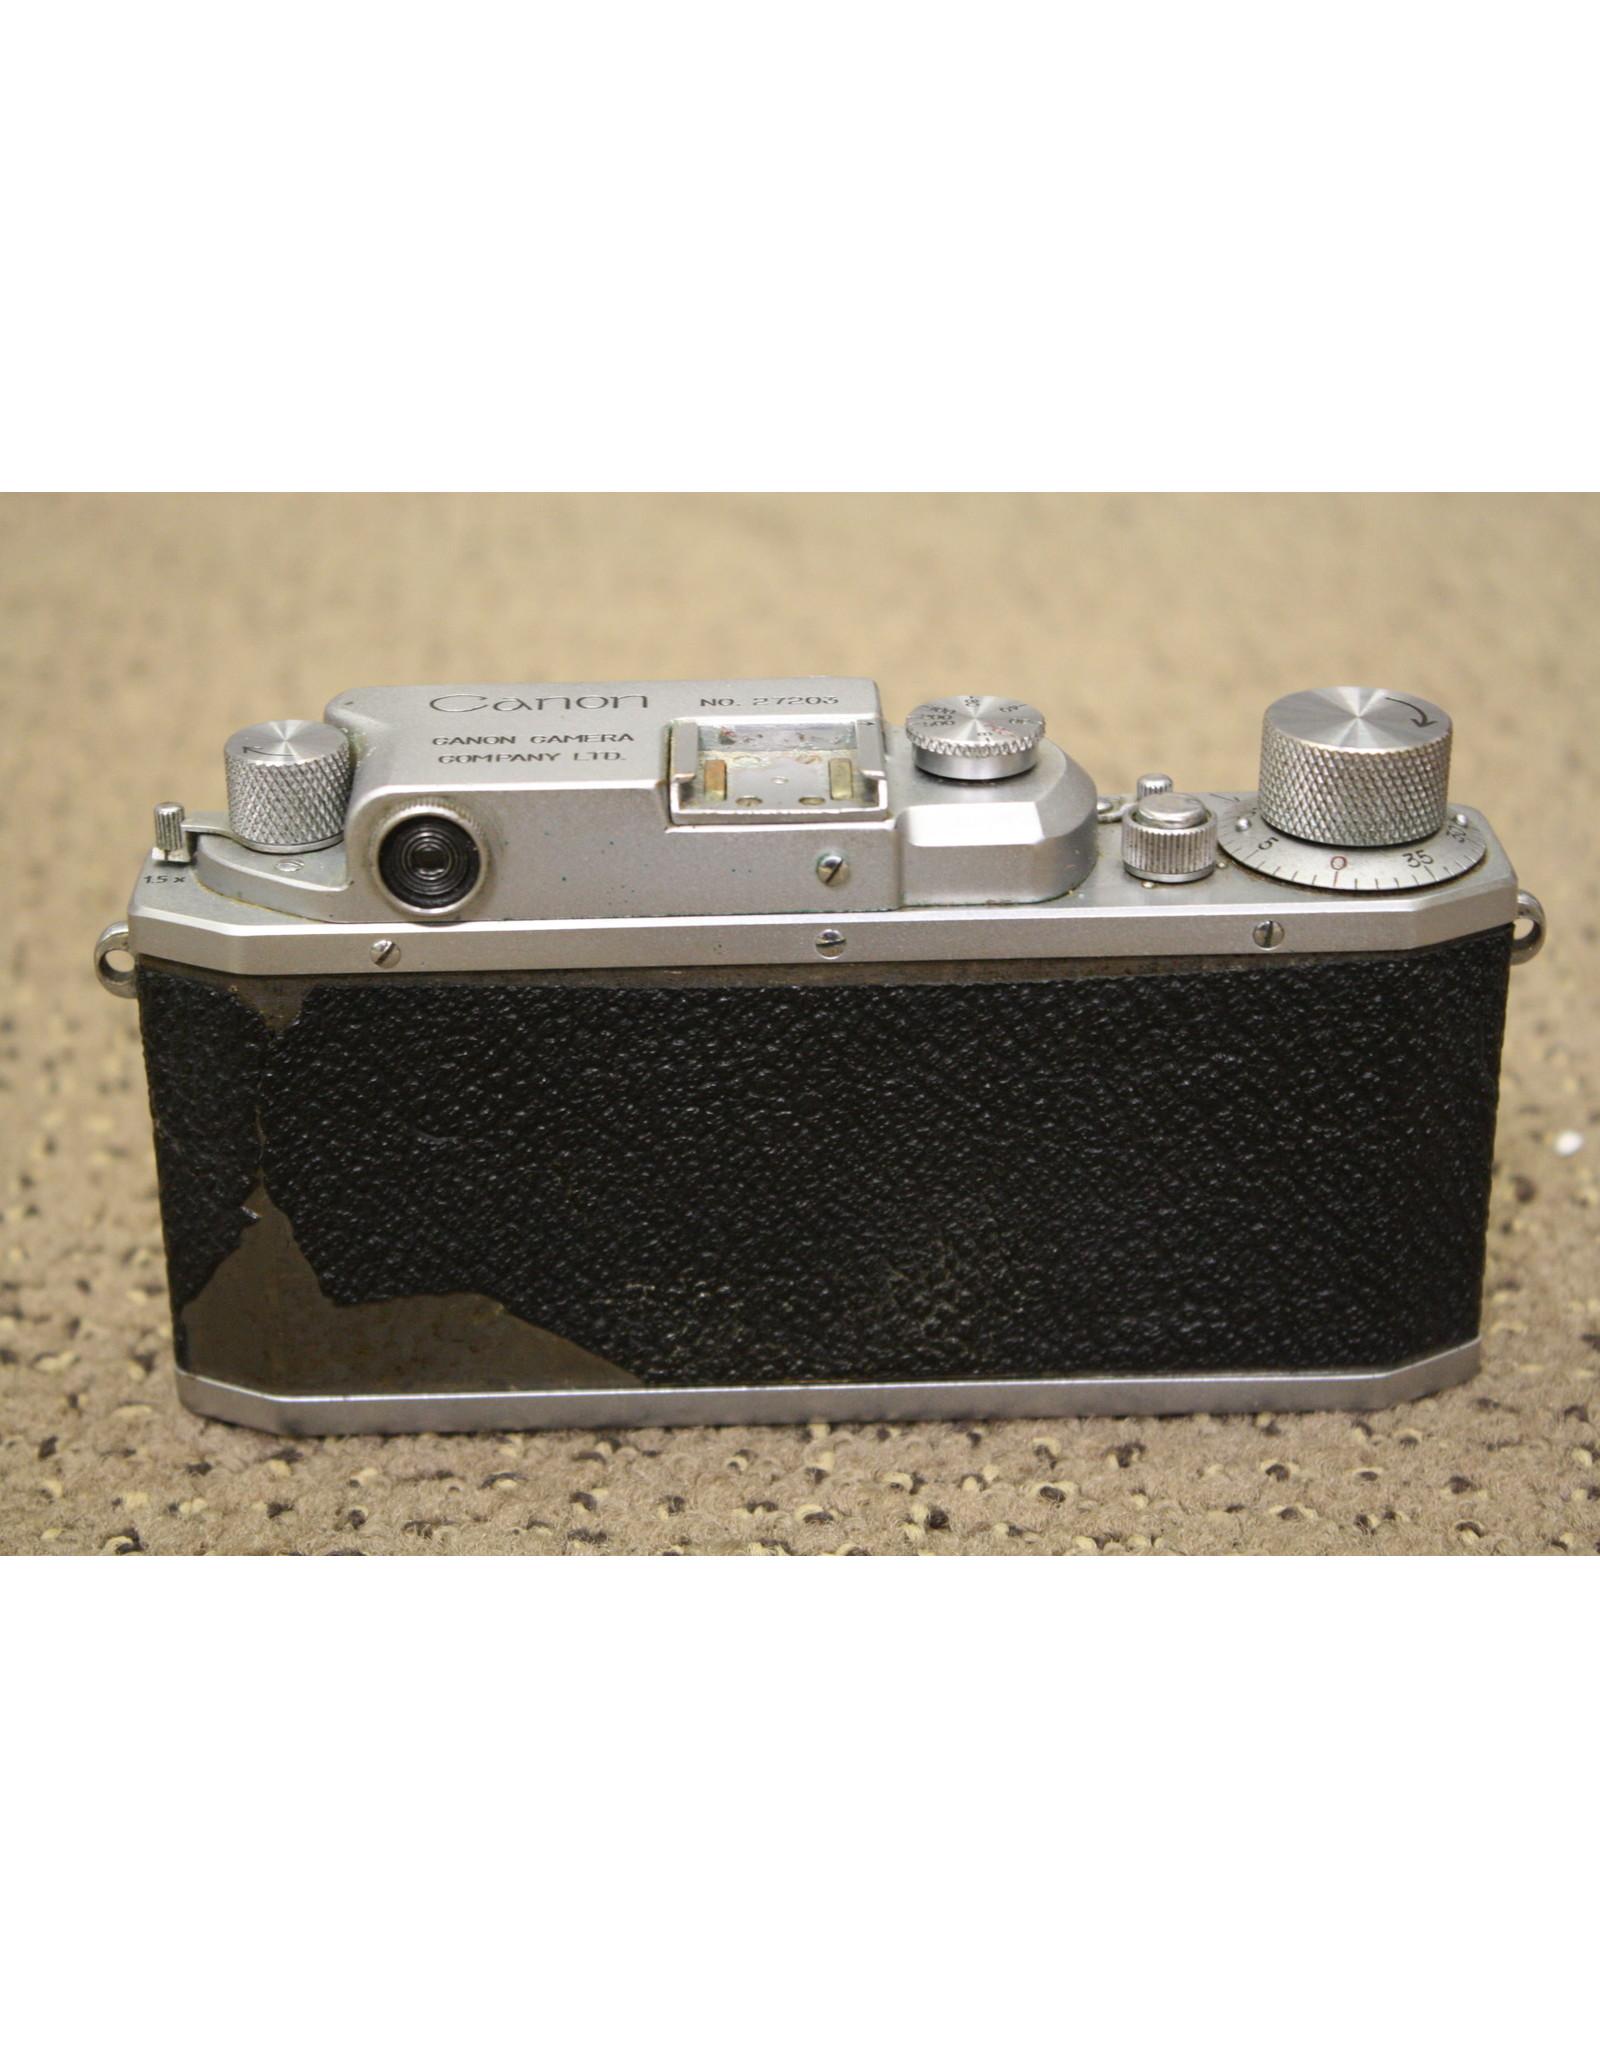 Canon CANON IIB RANGEFINDER CAMERA BODY  & CASE PLUS ACCESSORIES! (BROKEN SHUTTER)